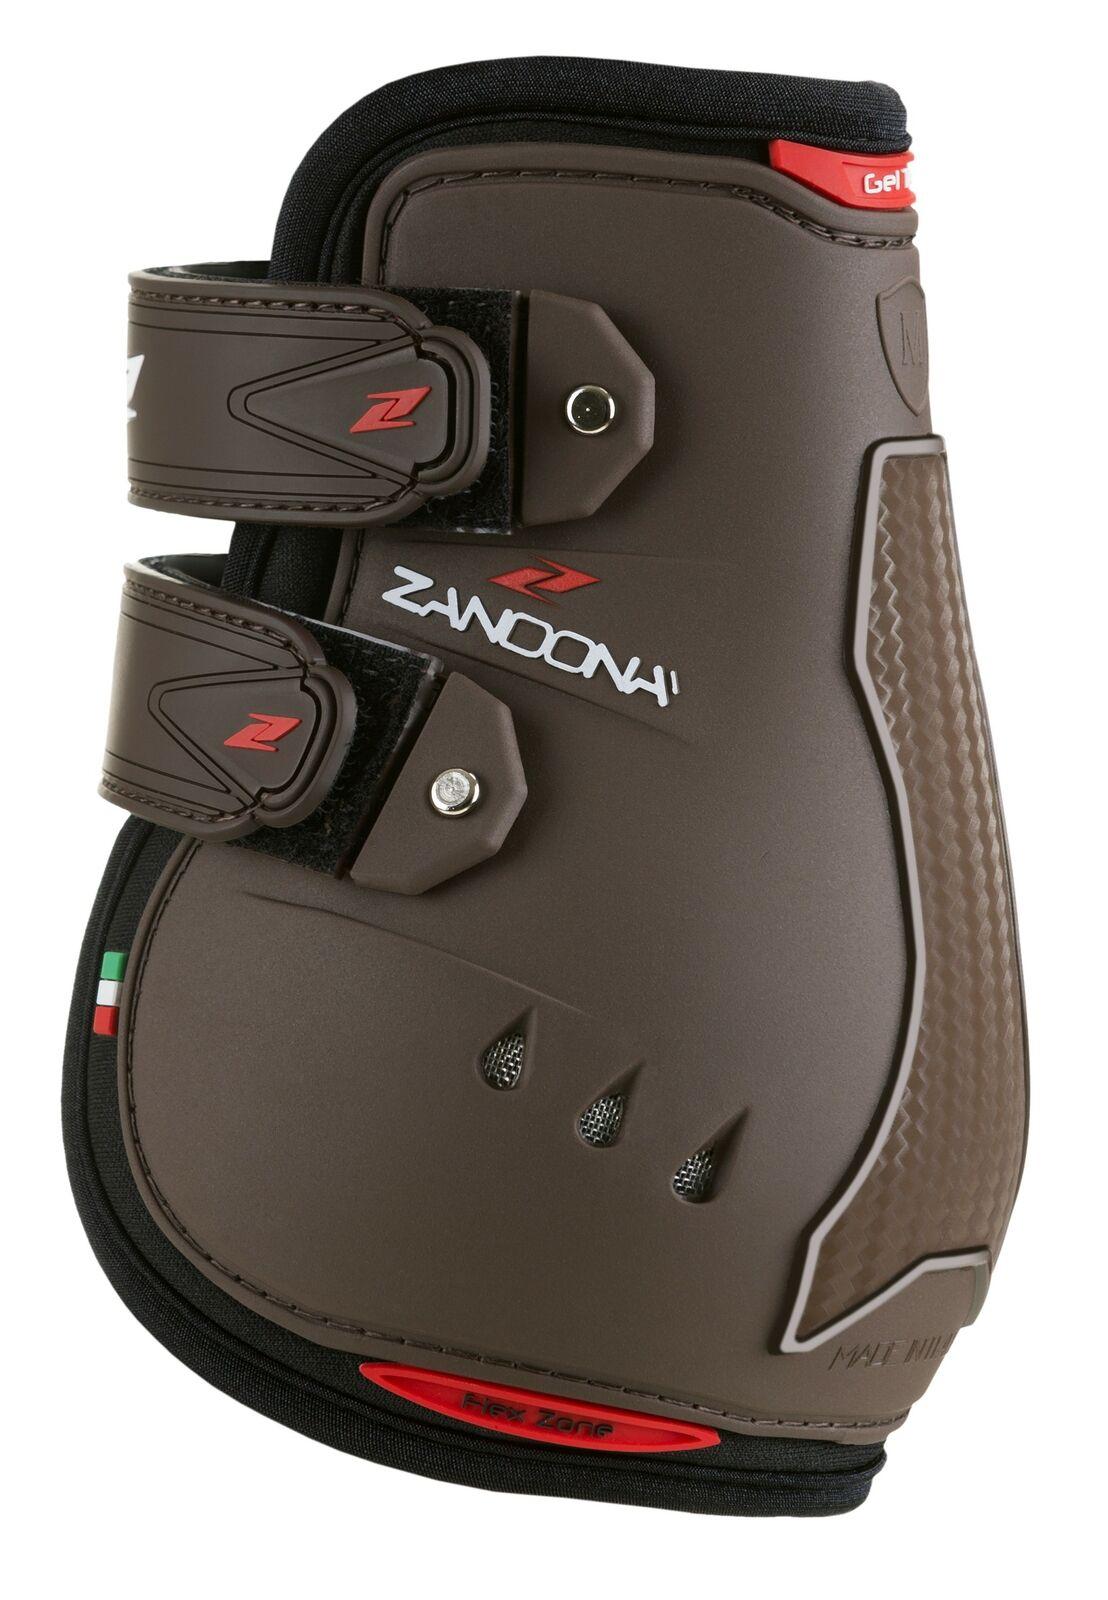 ZANDONA voiturebone Air Active Fit Velcro De Boulet de, marron